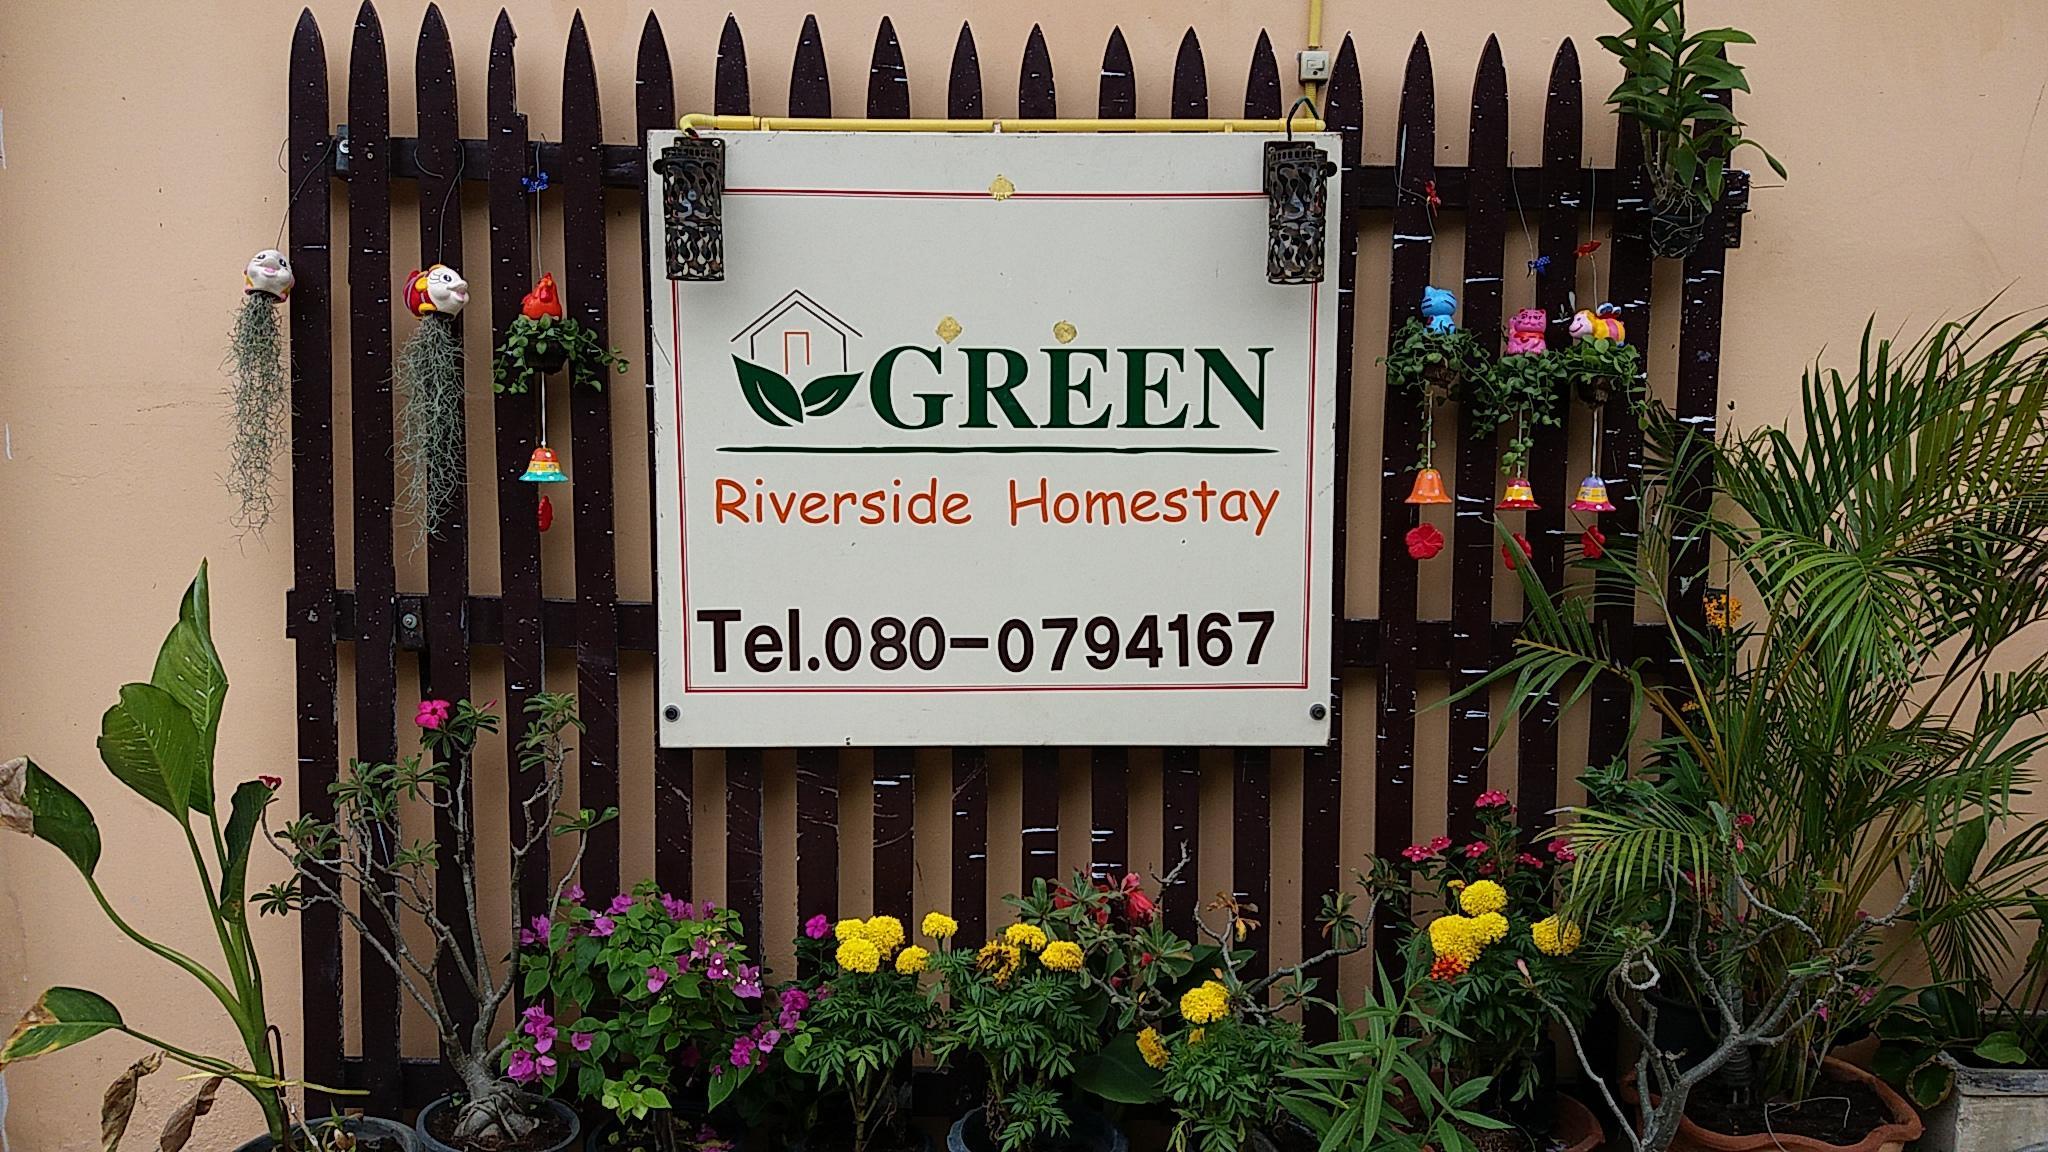 Green Riverside Homestay,กรีน ริเวอร์ไซด์ โฮมเสตย์